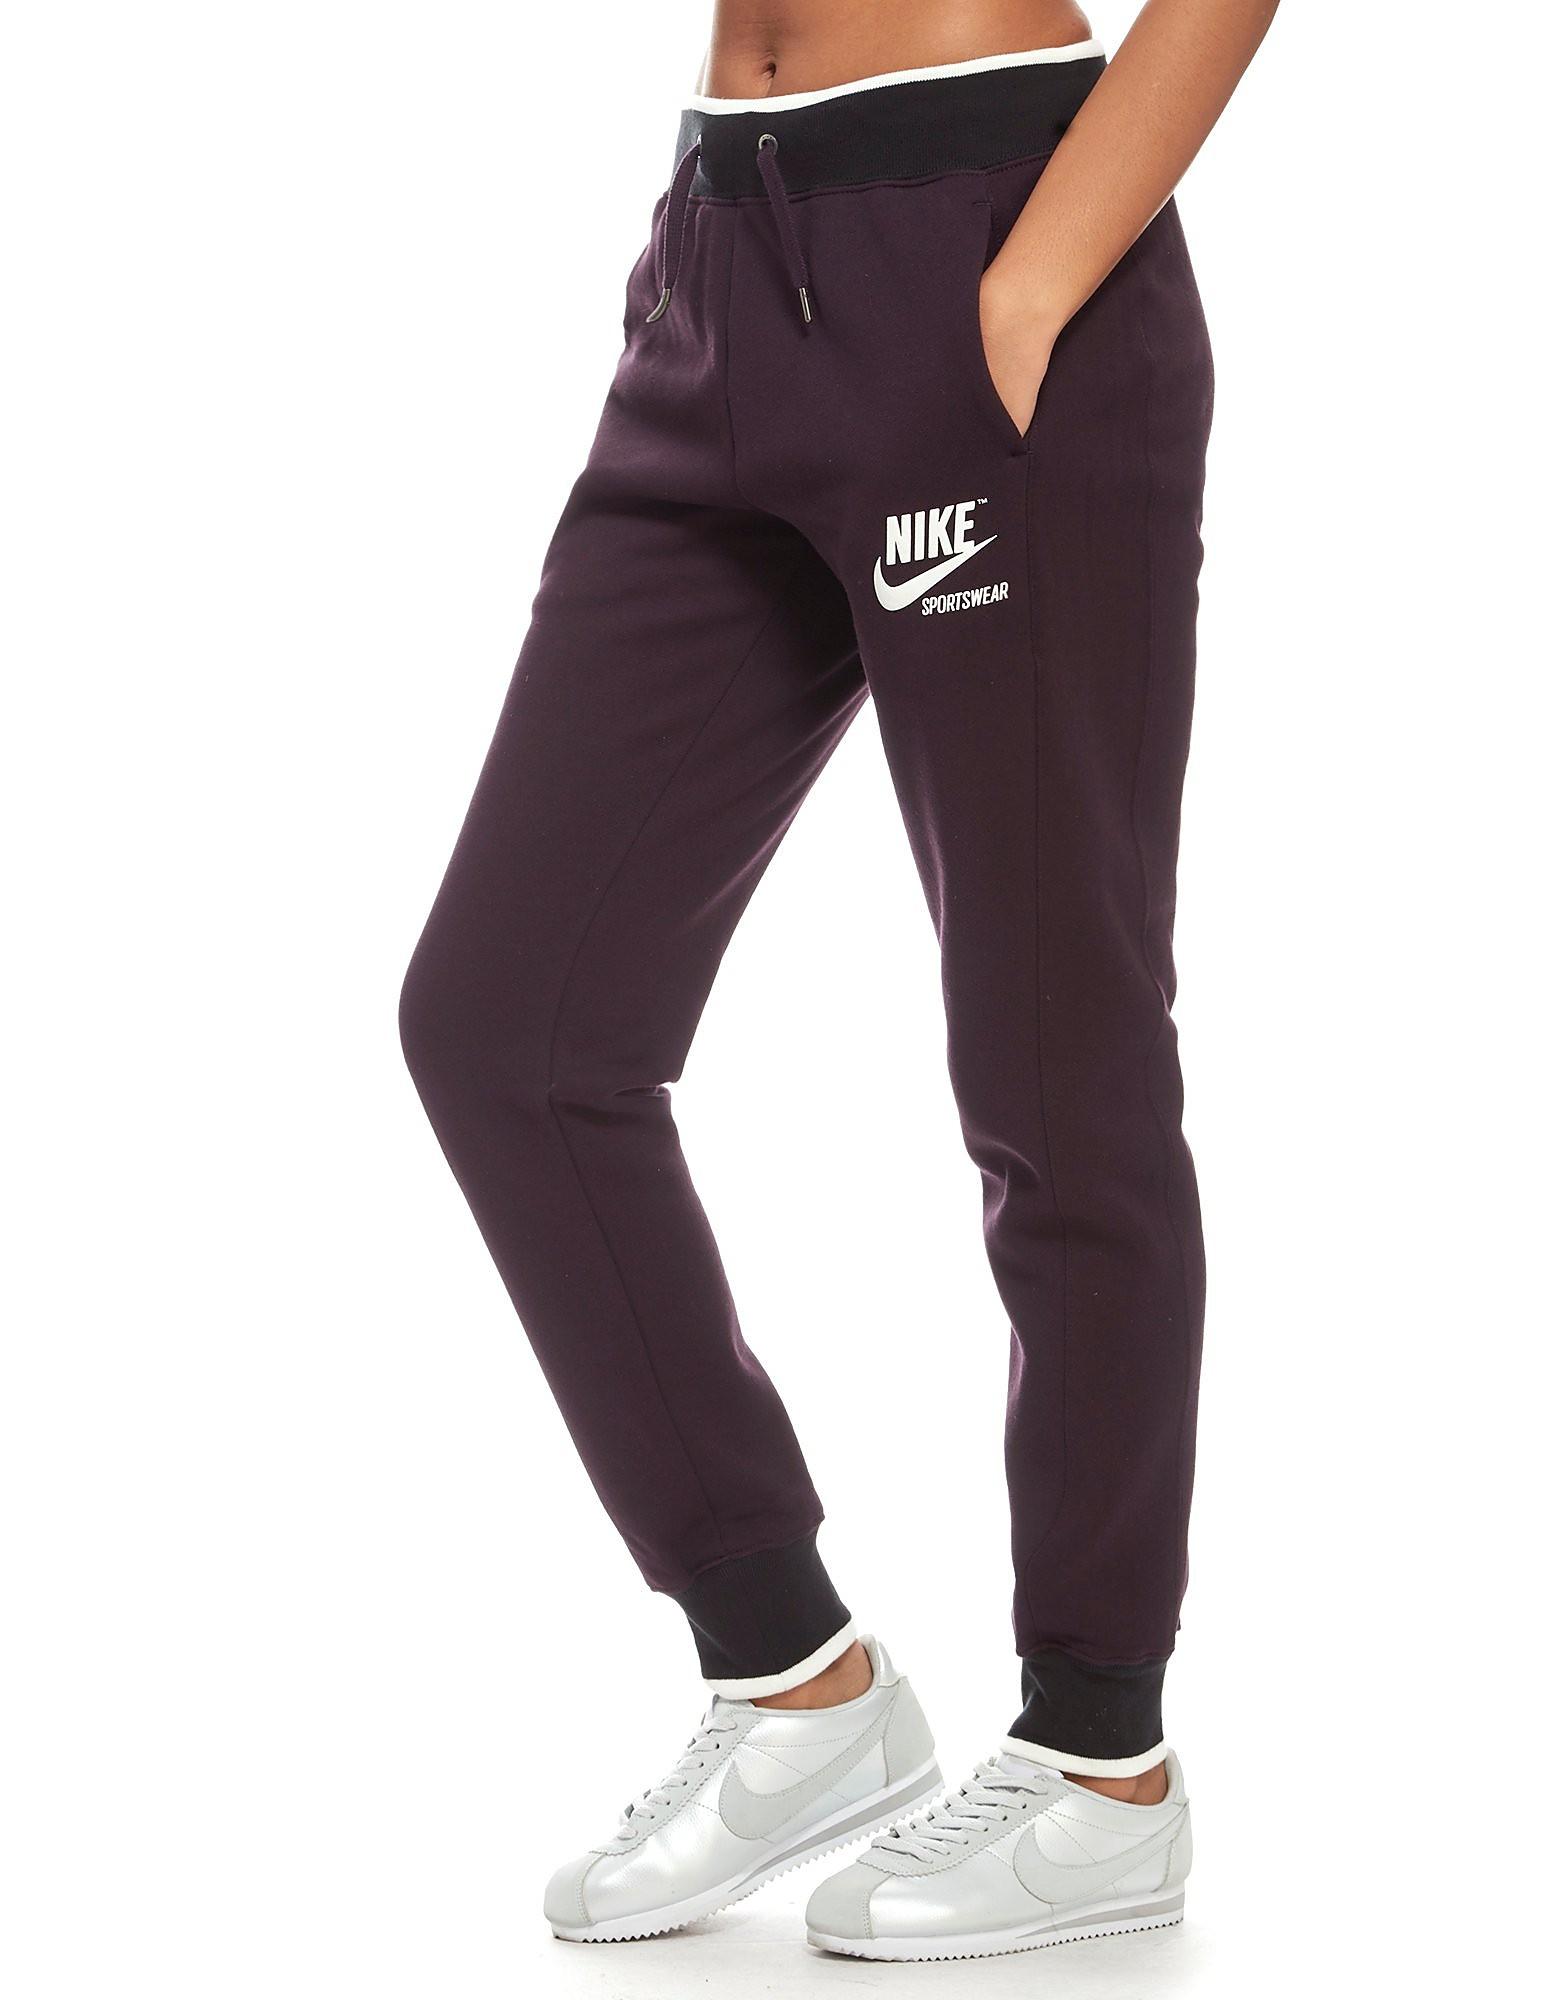 Nike pantalón de chándal Archive